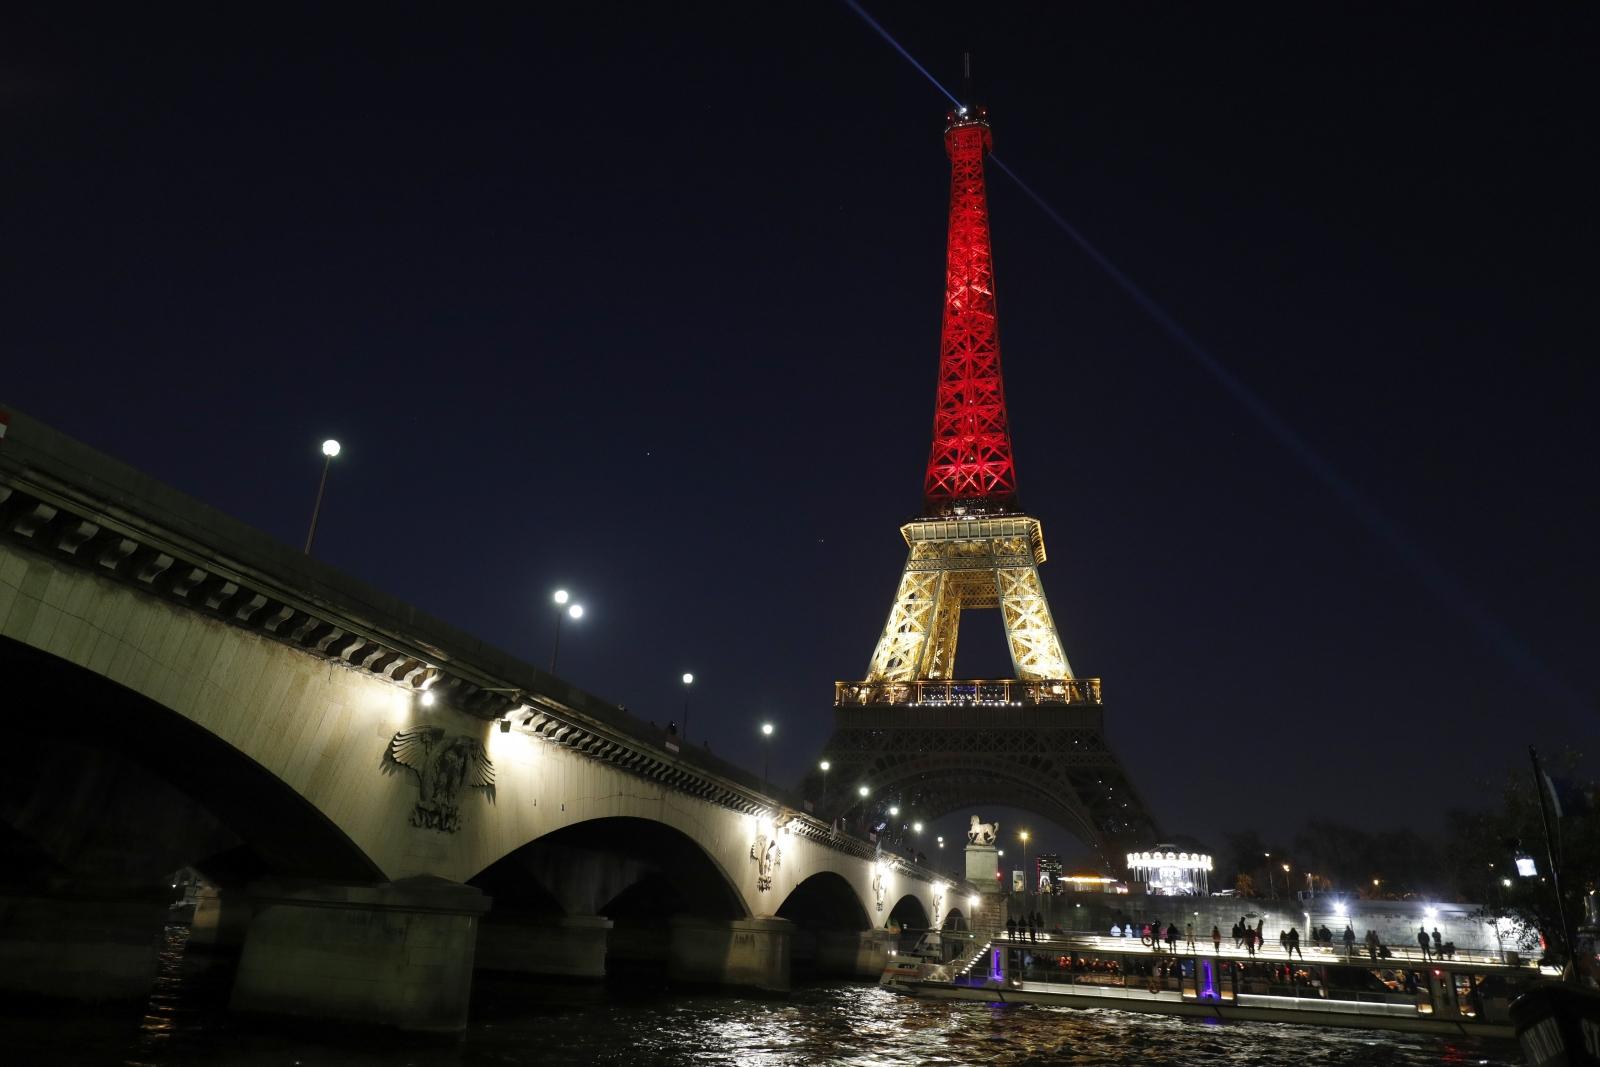 November 2015 Paris attack